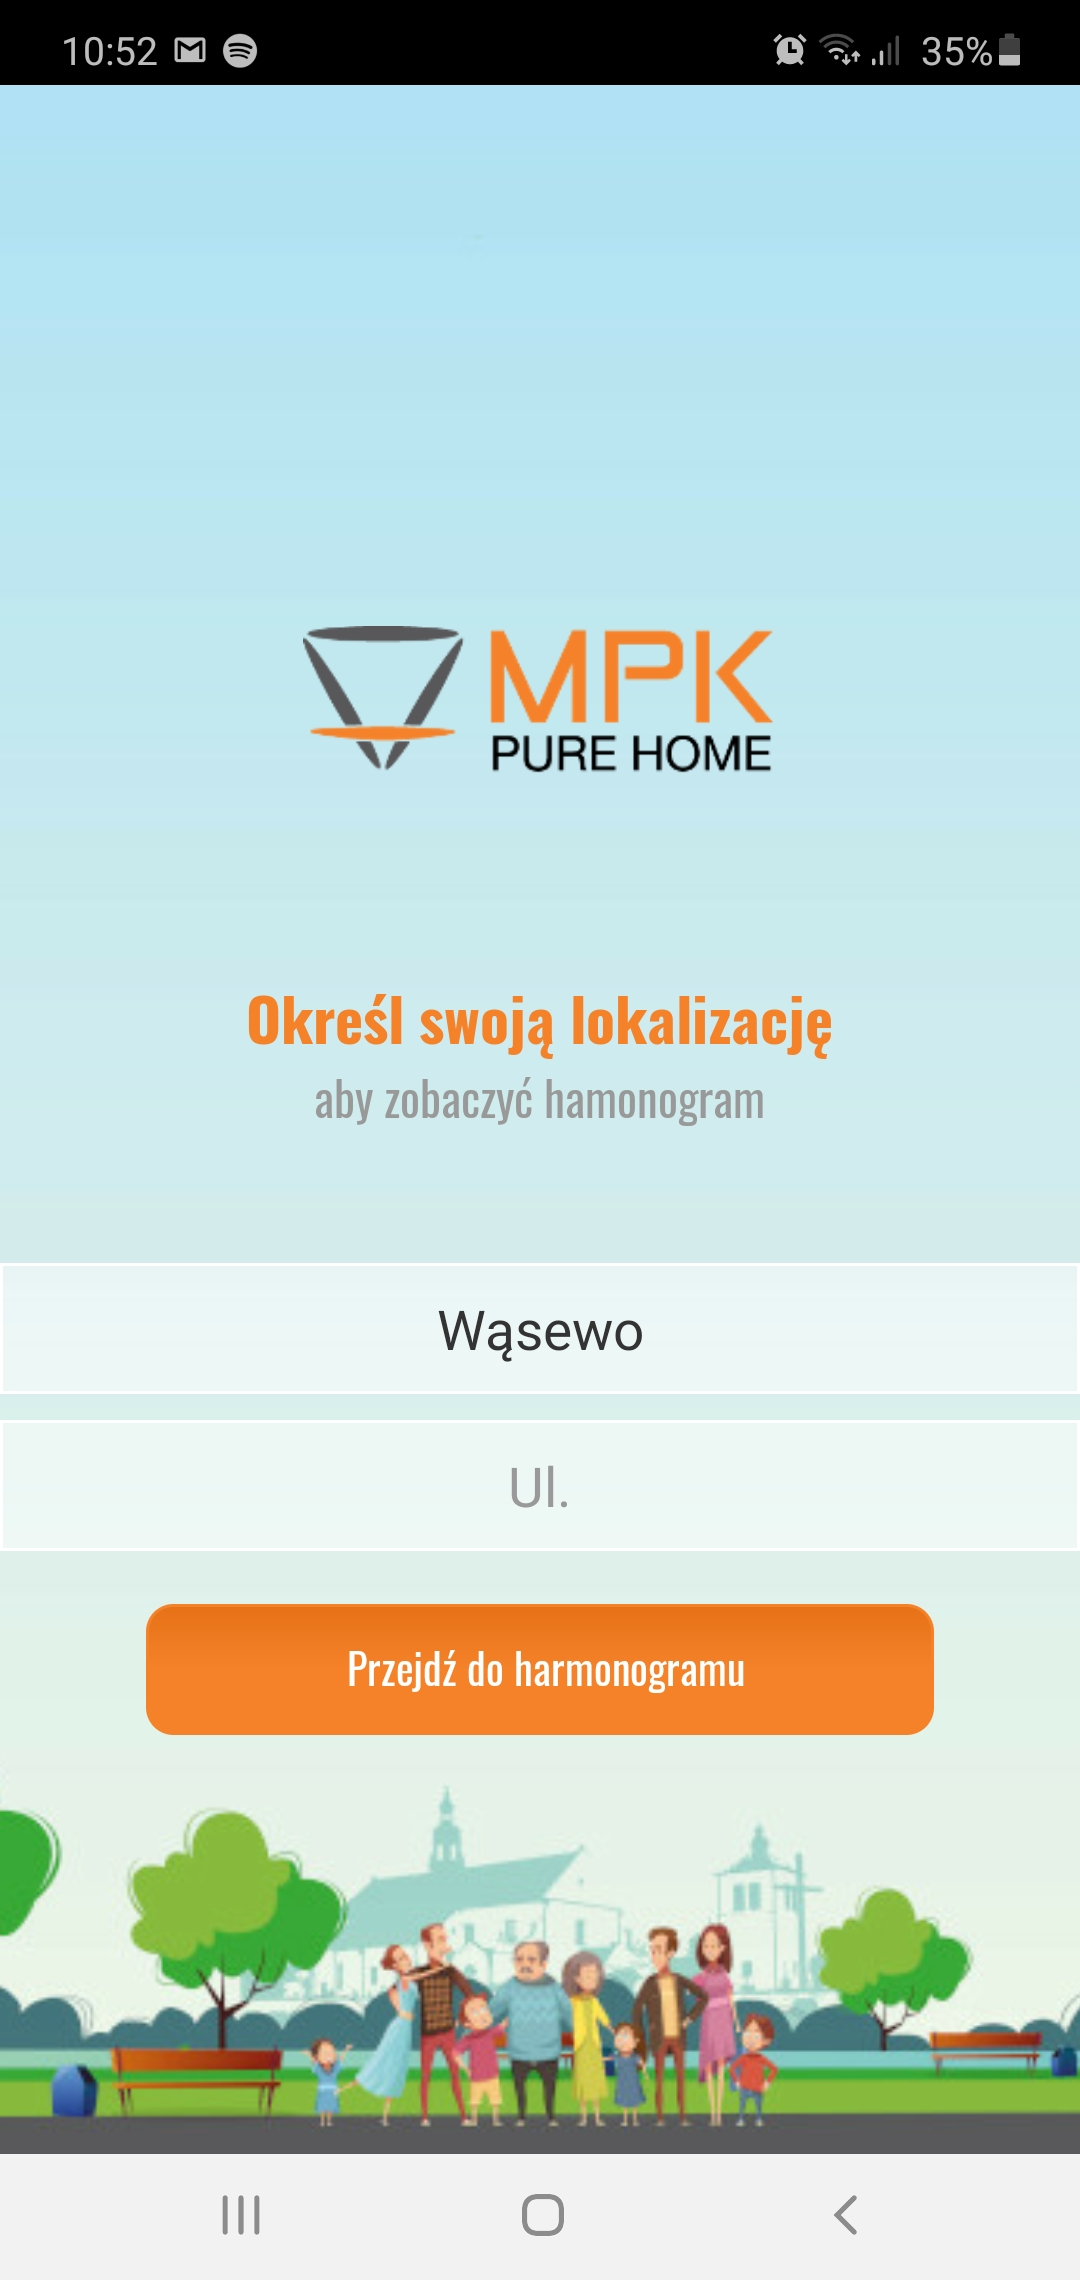 Screenshot_20200729-105247_MPK Pure Home_wasewo